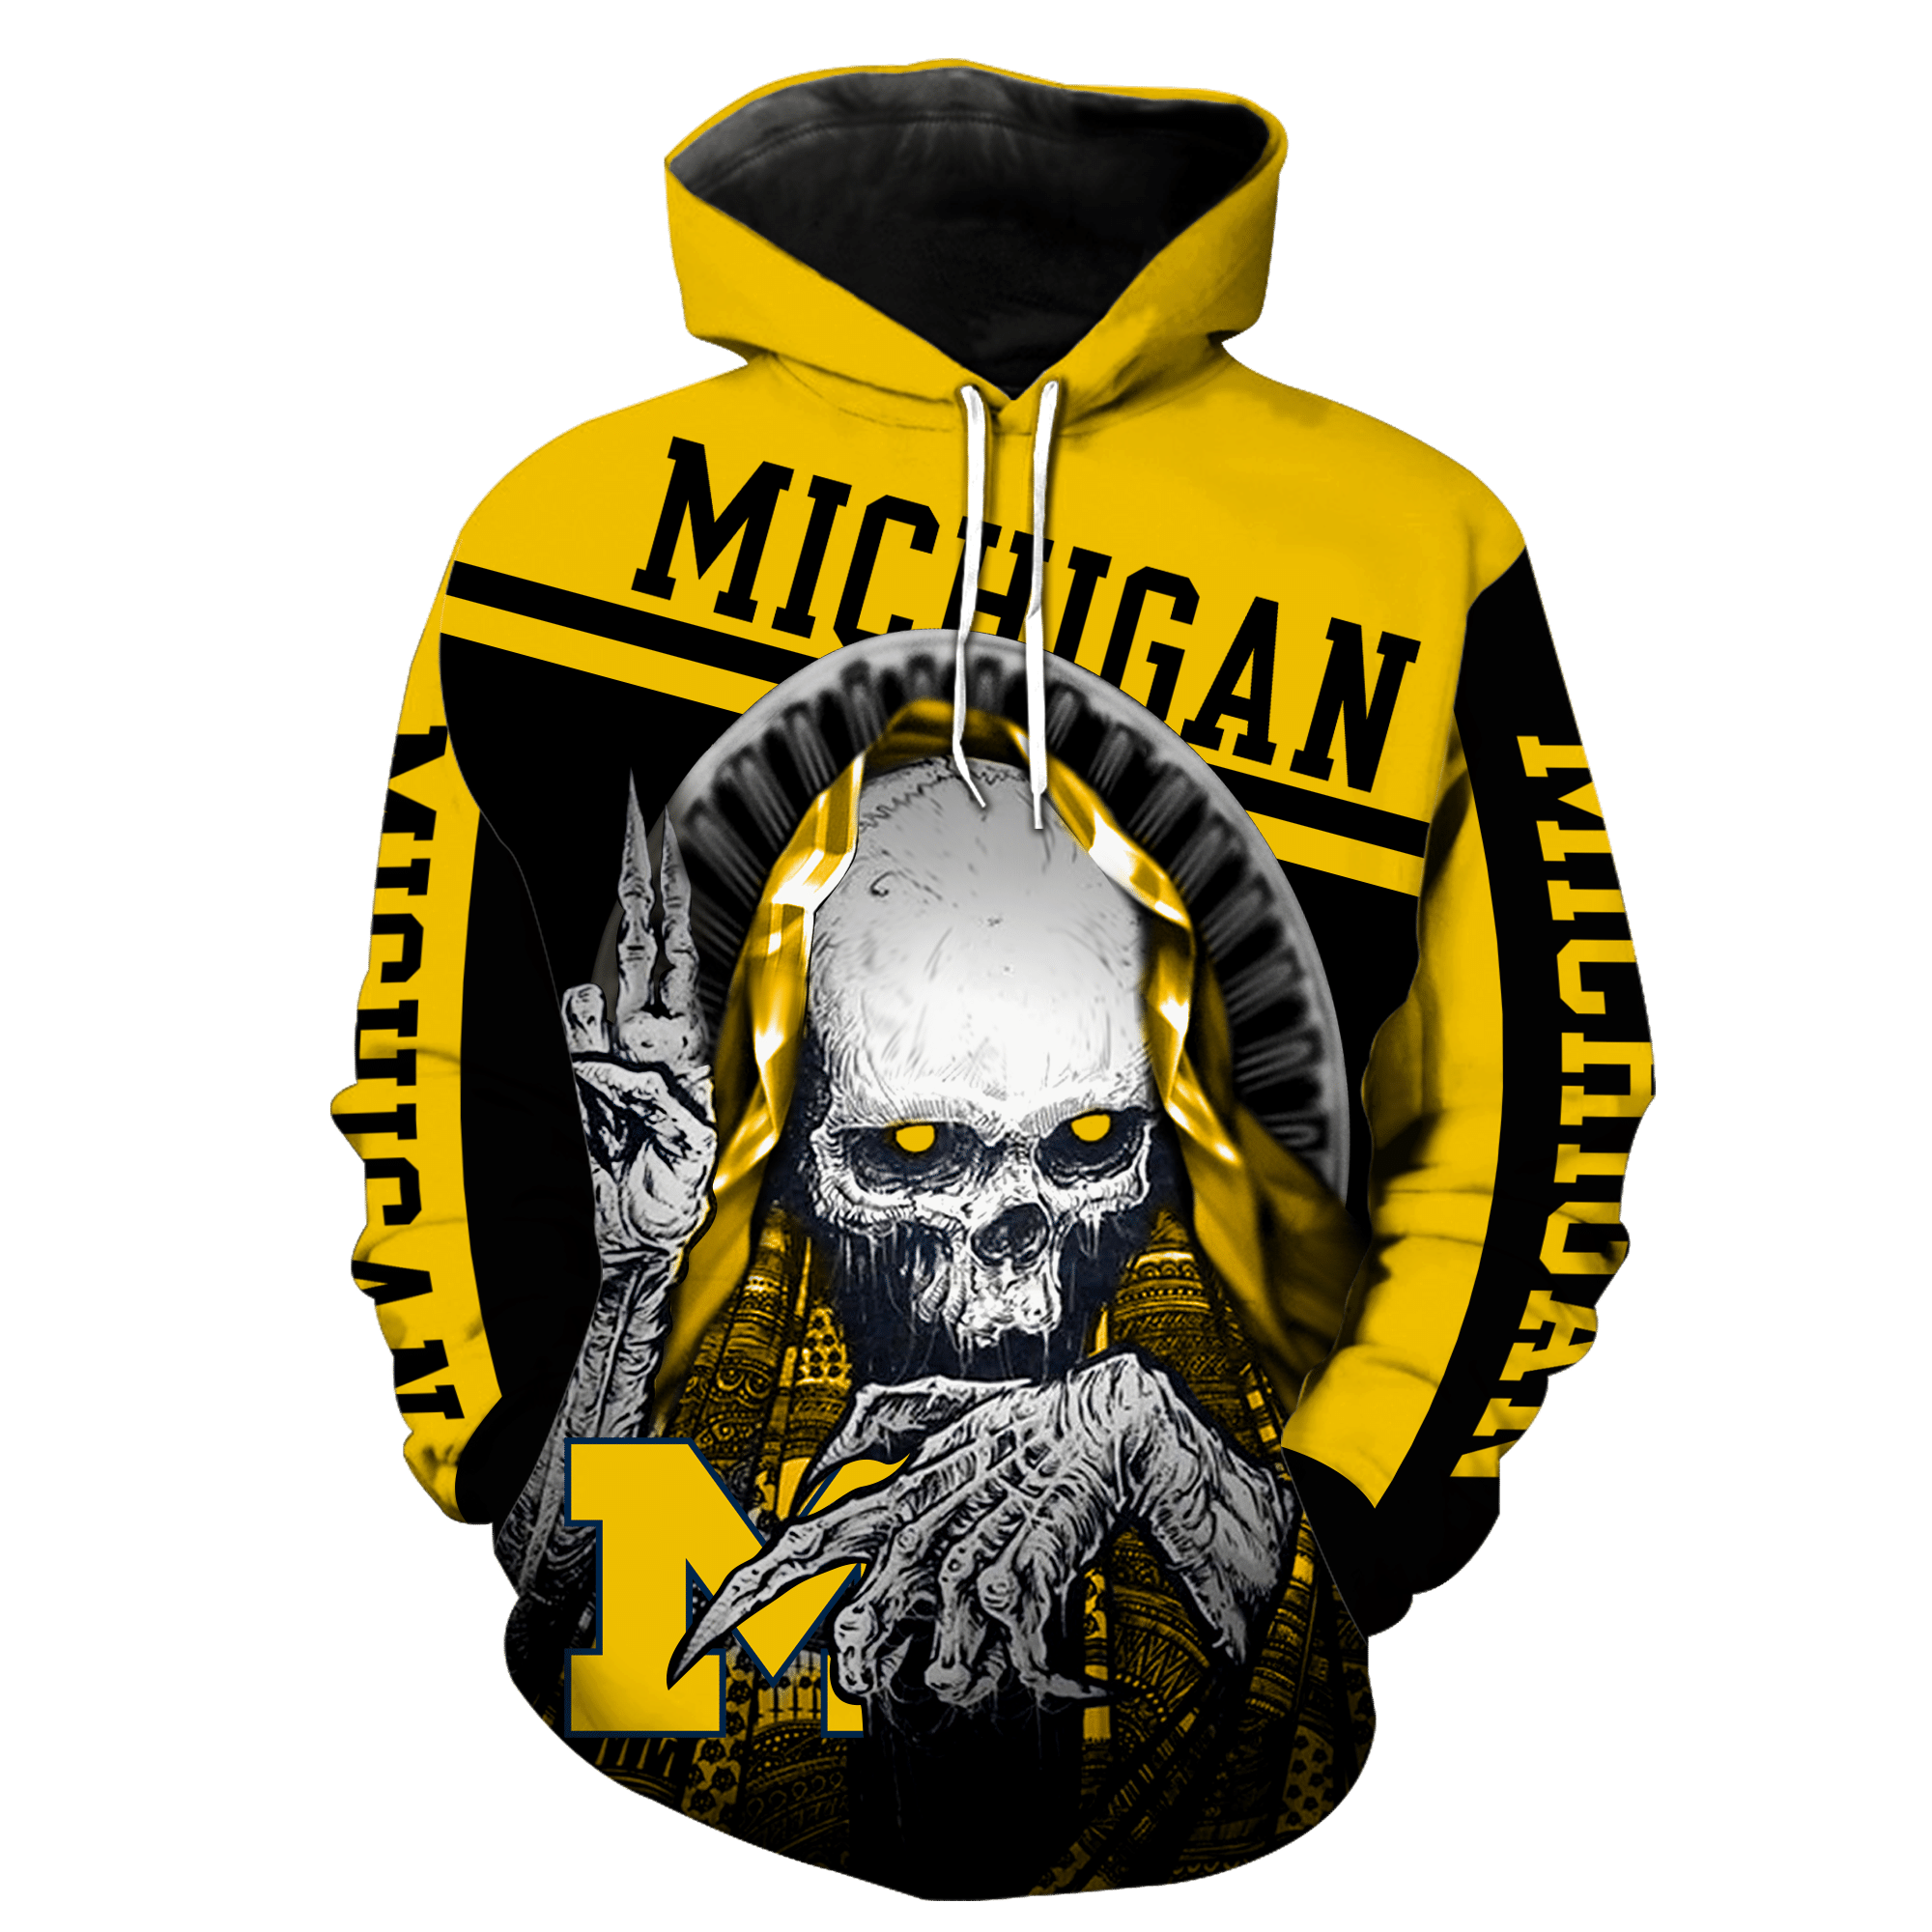 NCAA Michigan Wolverines Skull Hoodie and T-shirt